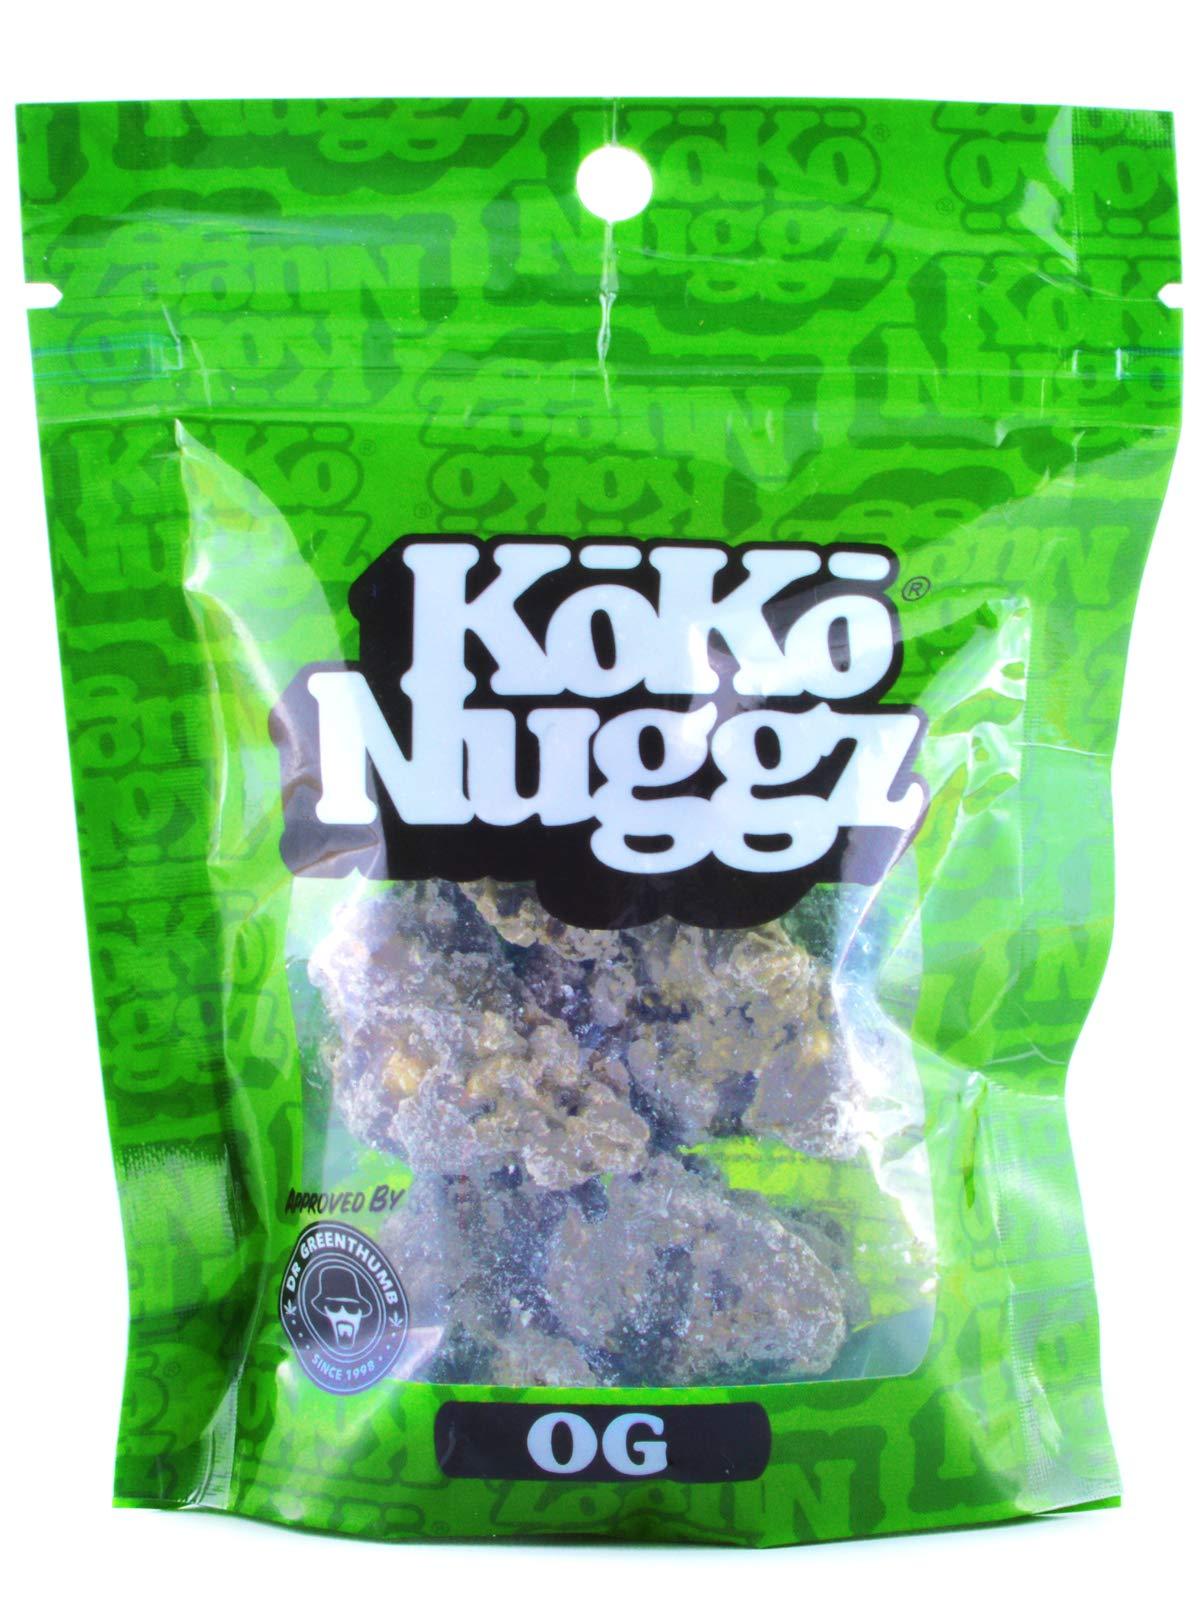 Cali Sweets KoKo Nuggz OG Flavoured Chocolate 1oz Bag